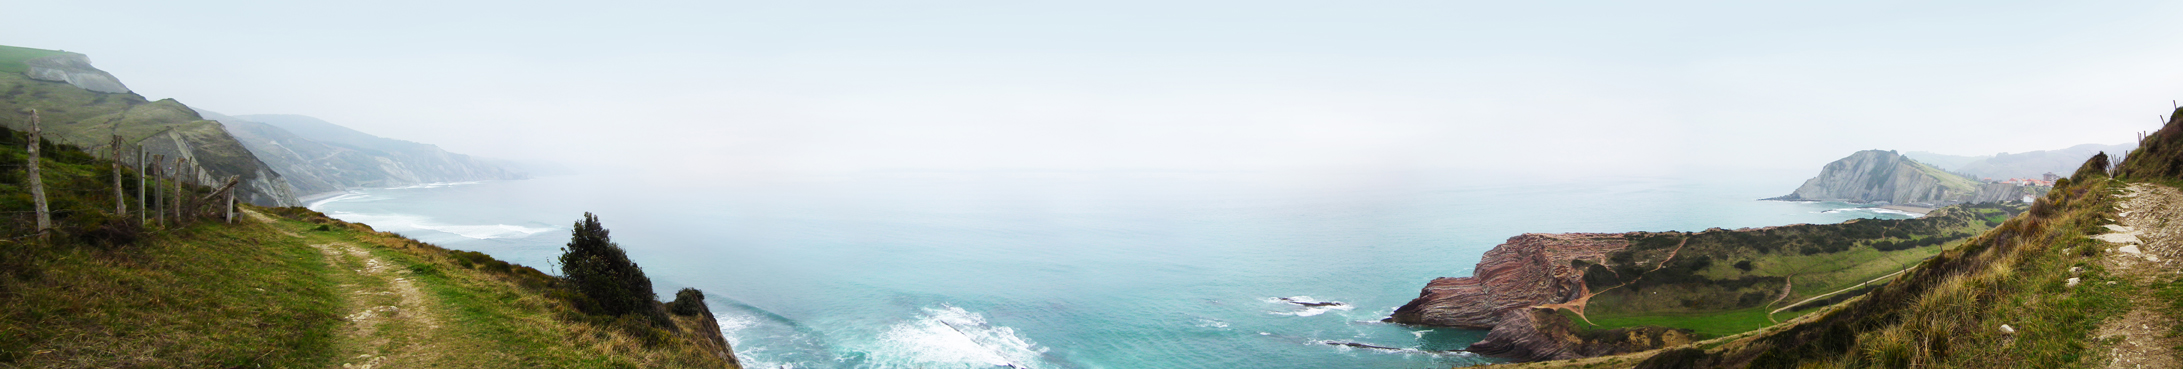 zumaia panorama